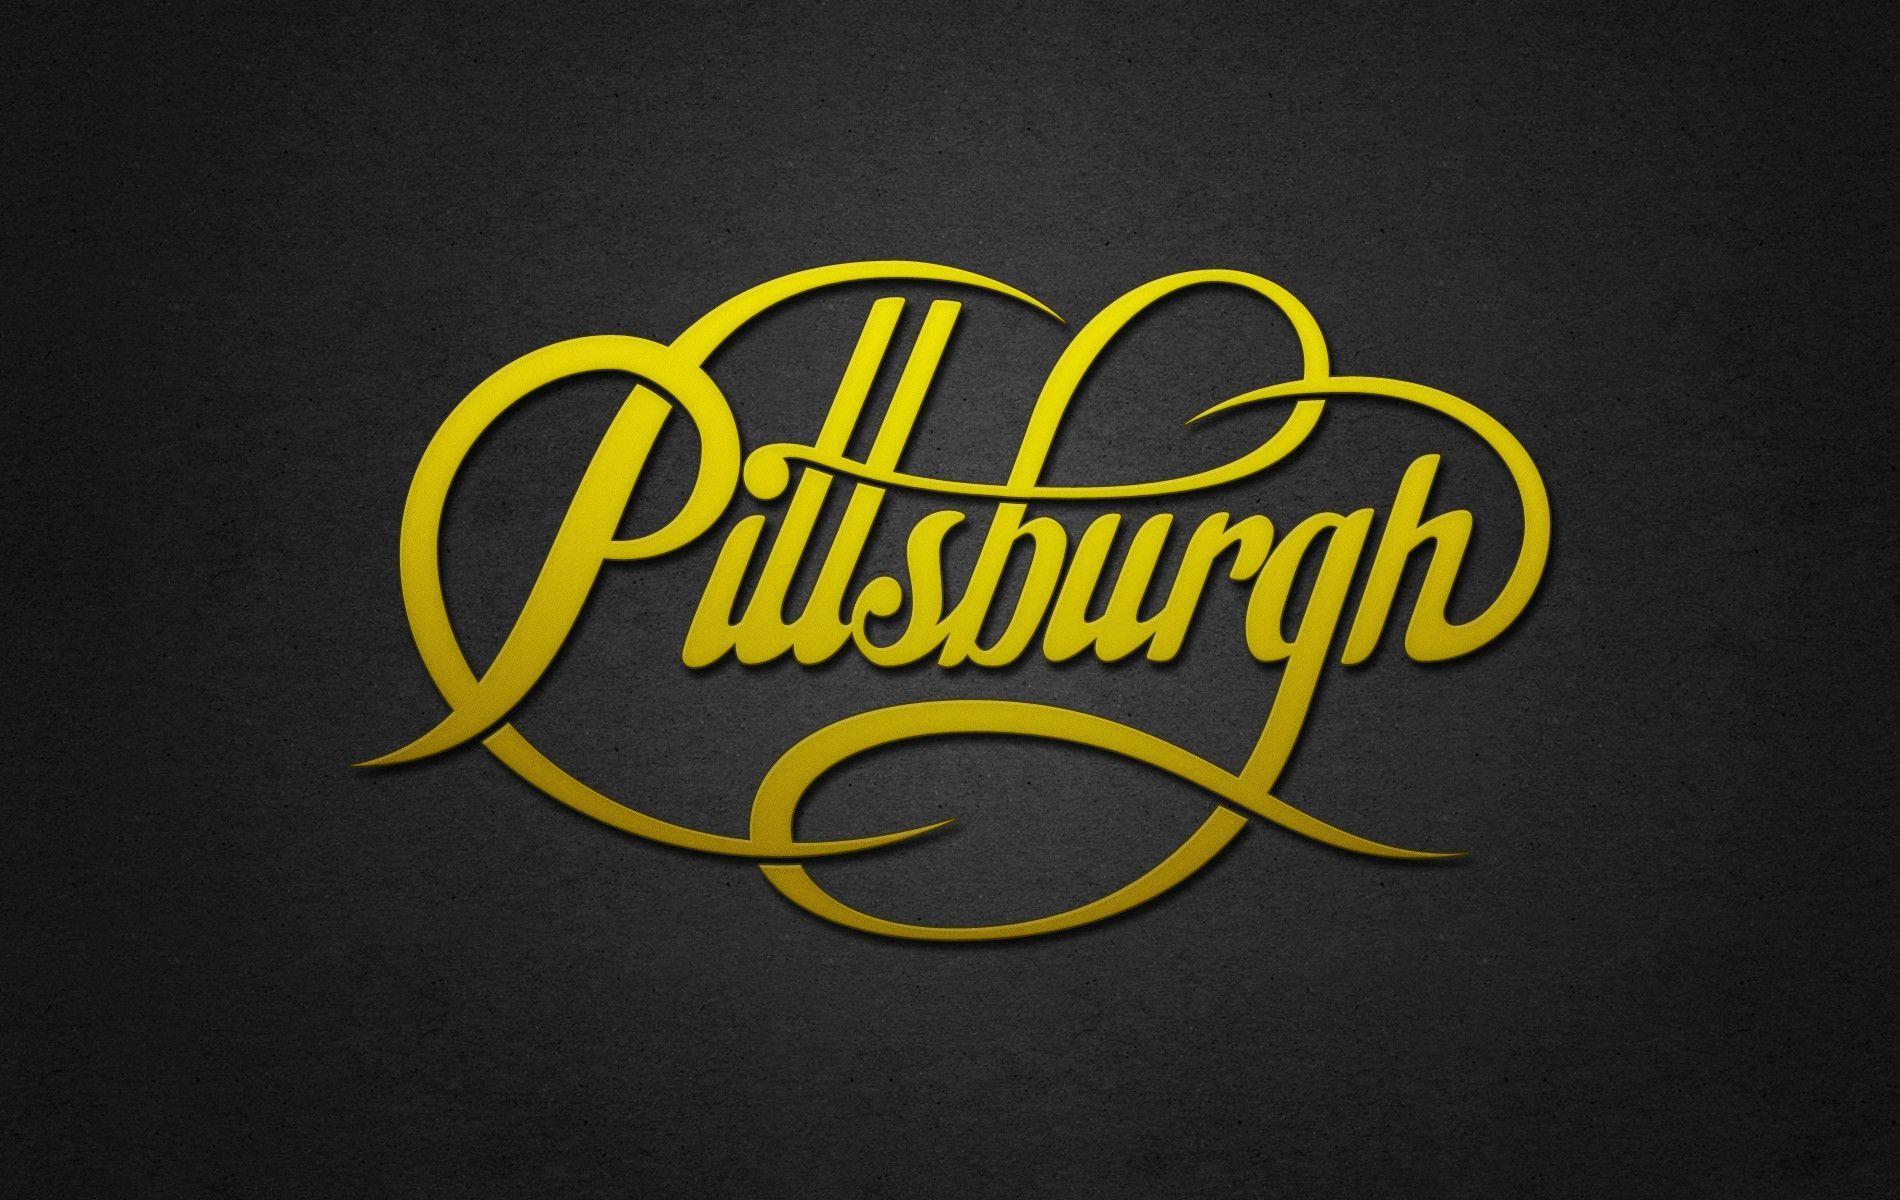 Download Pittsburg Steelers HD Logo Wallpaper 2017 1900x1200